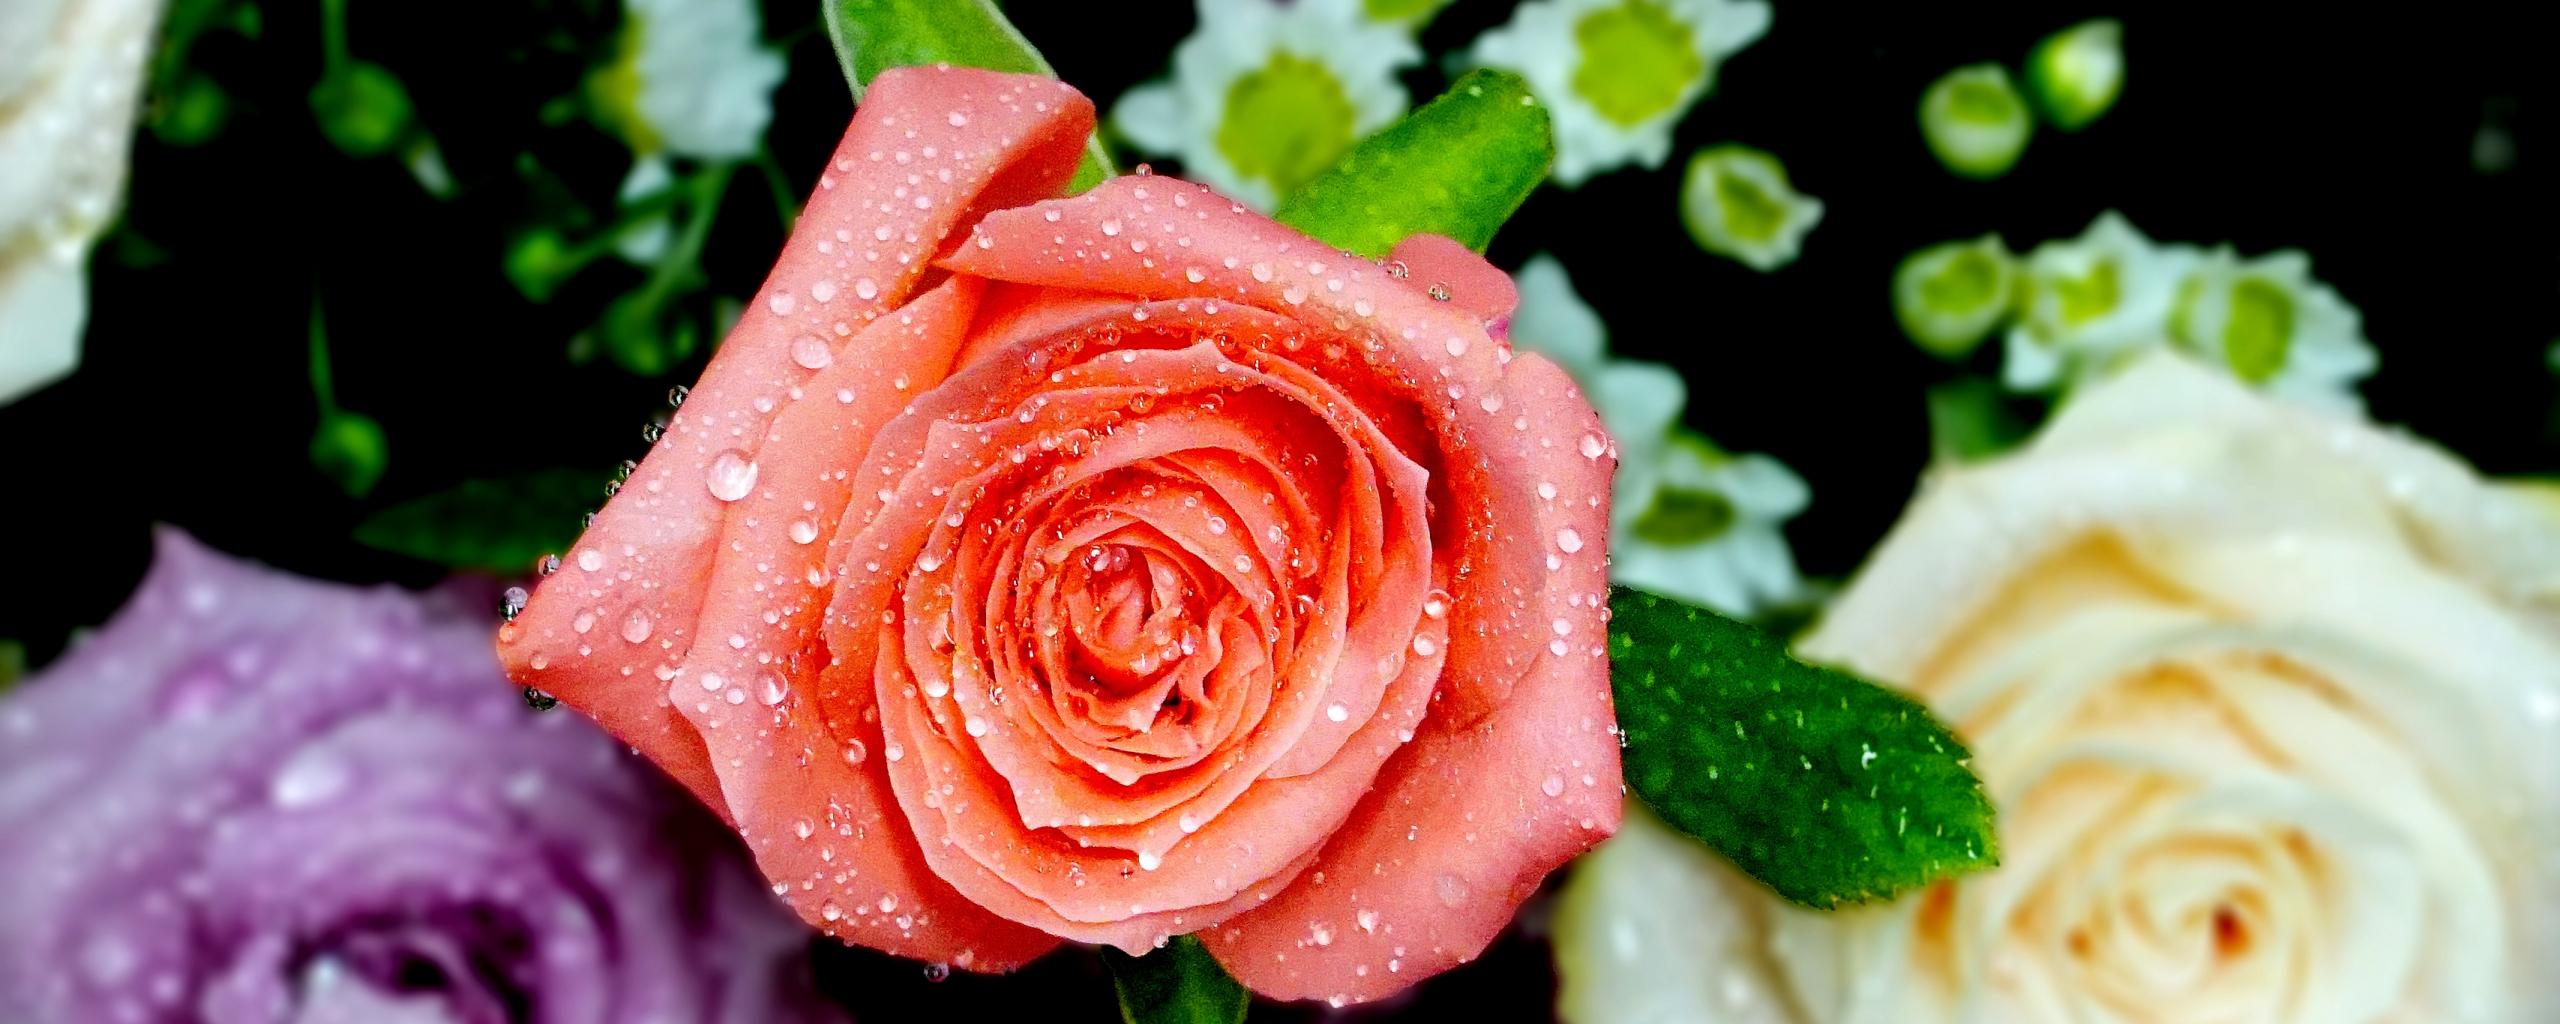 2560x1024 wallpaper Roses, flowers, water drops